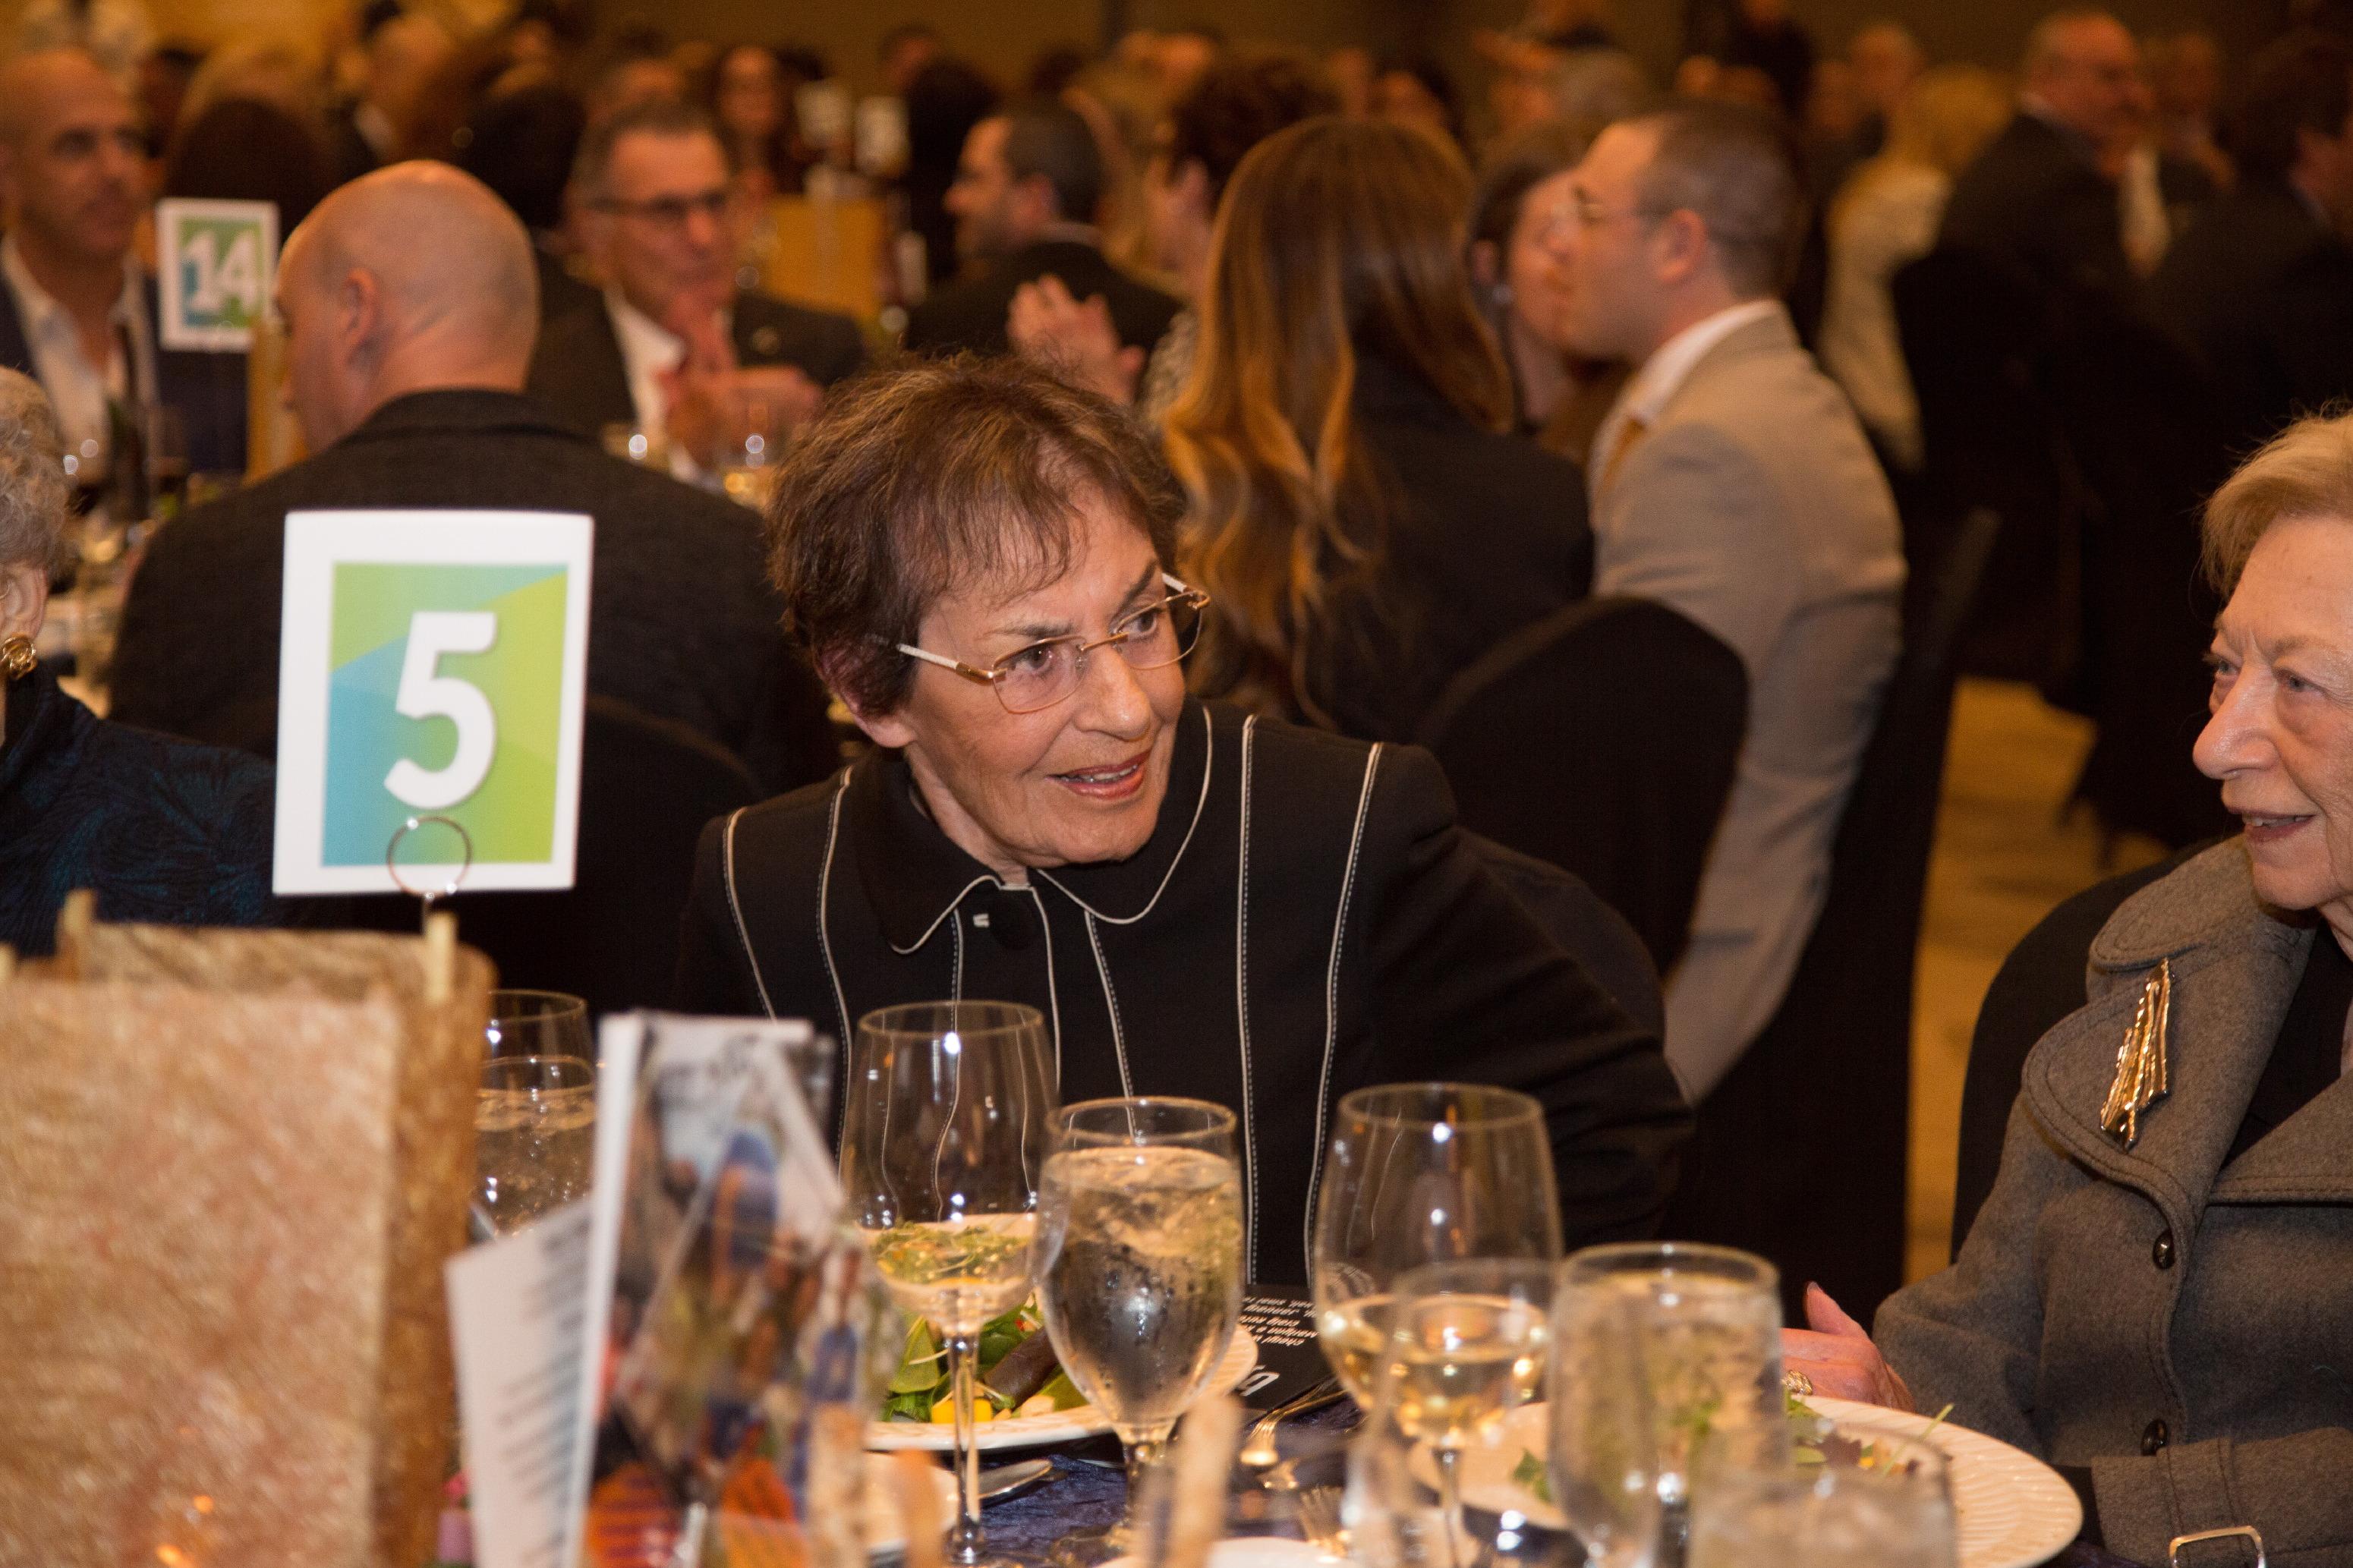 Past BJE Board President Janet Farber